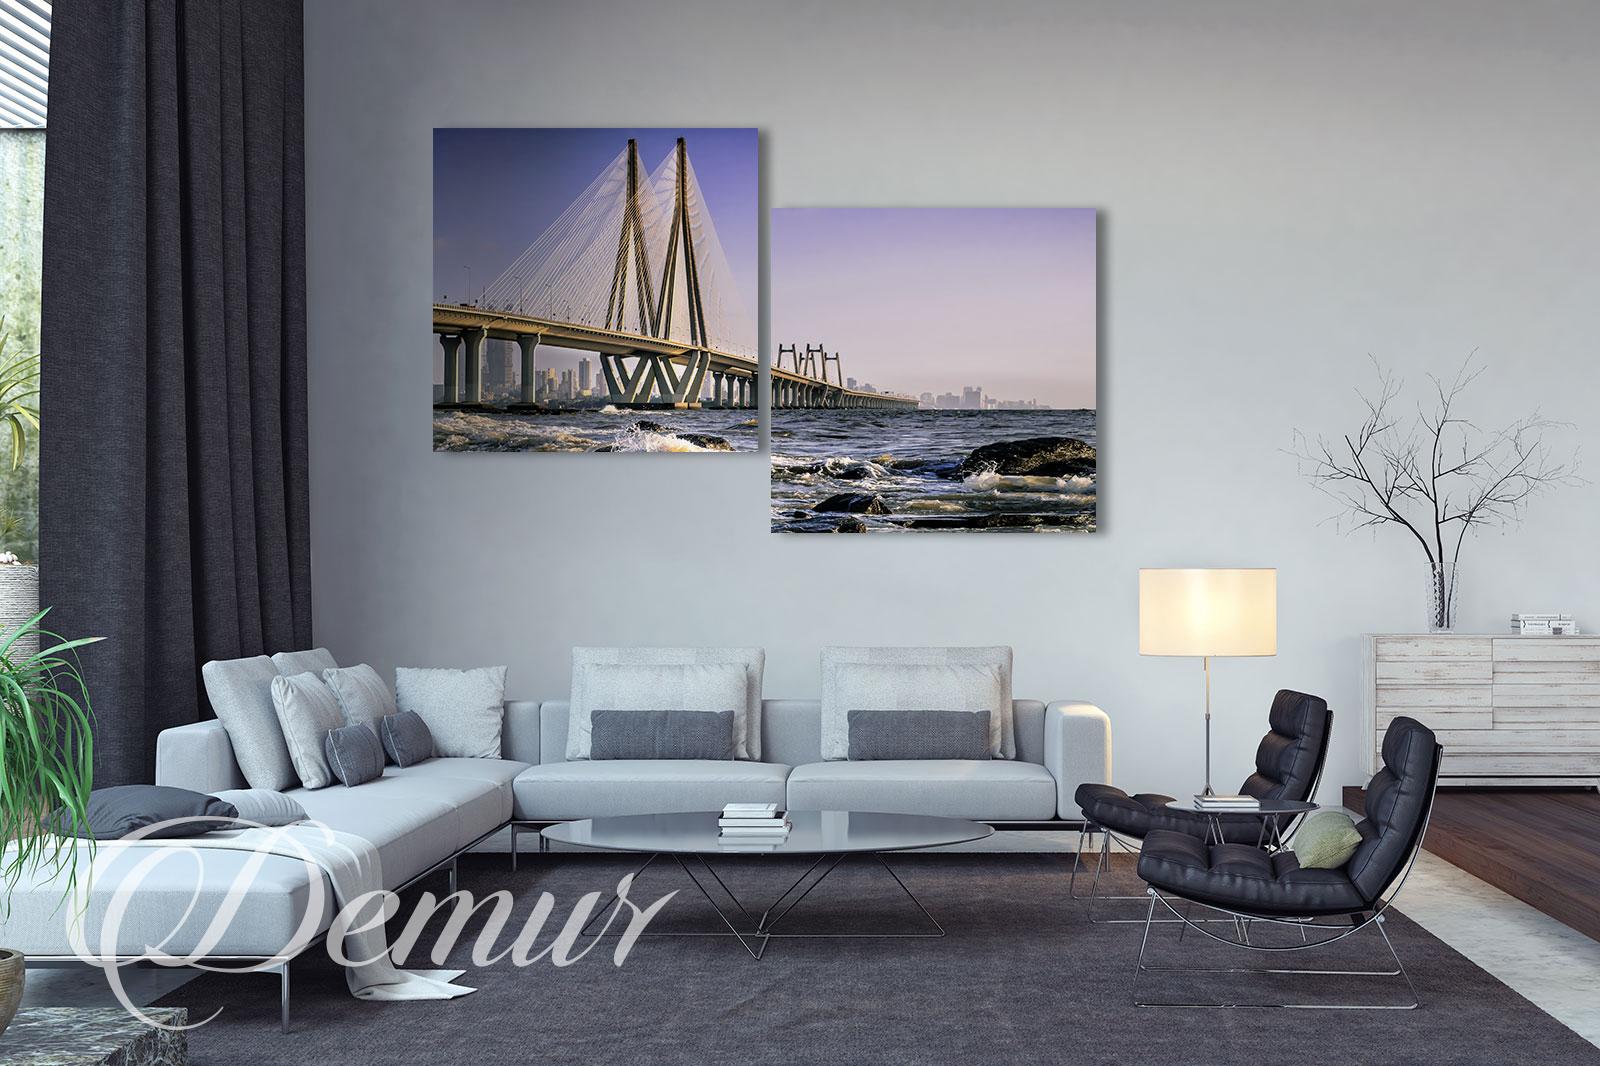 Obraz Most - Jaki obraz do salonu - Demur